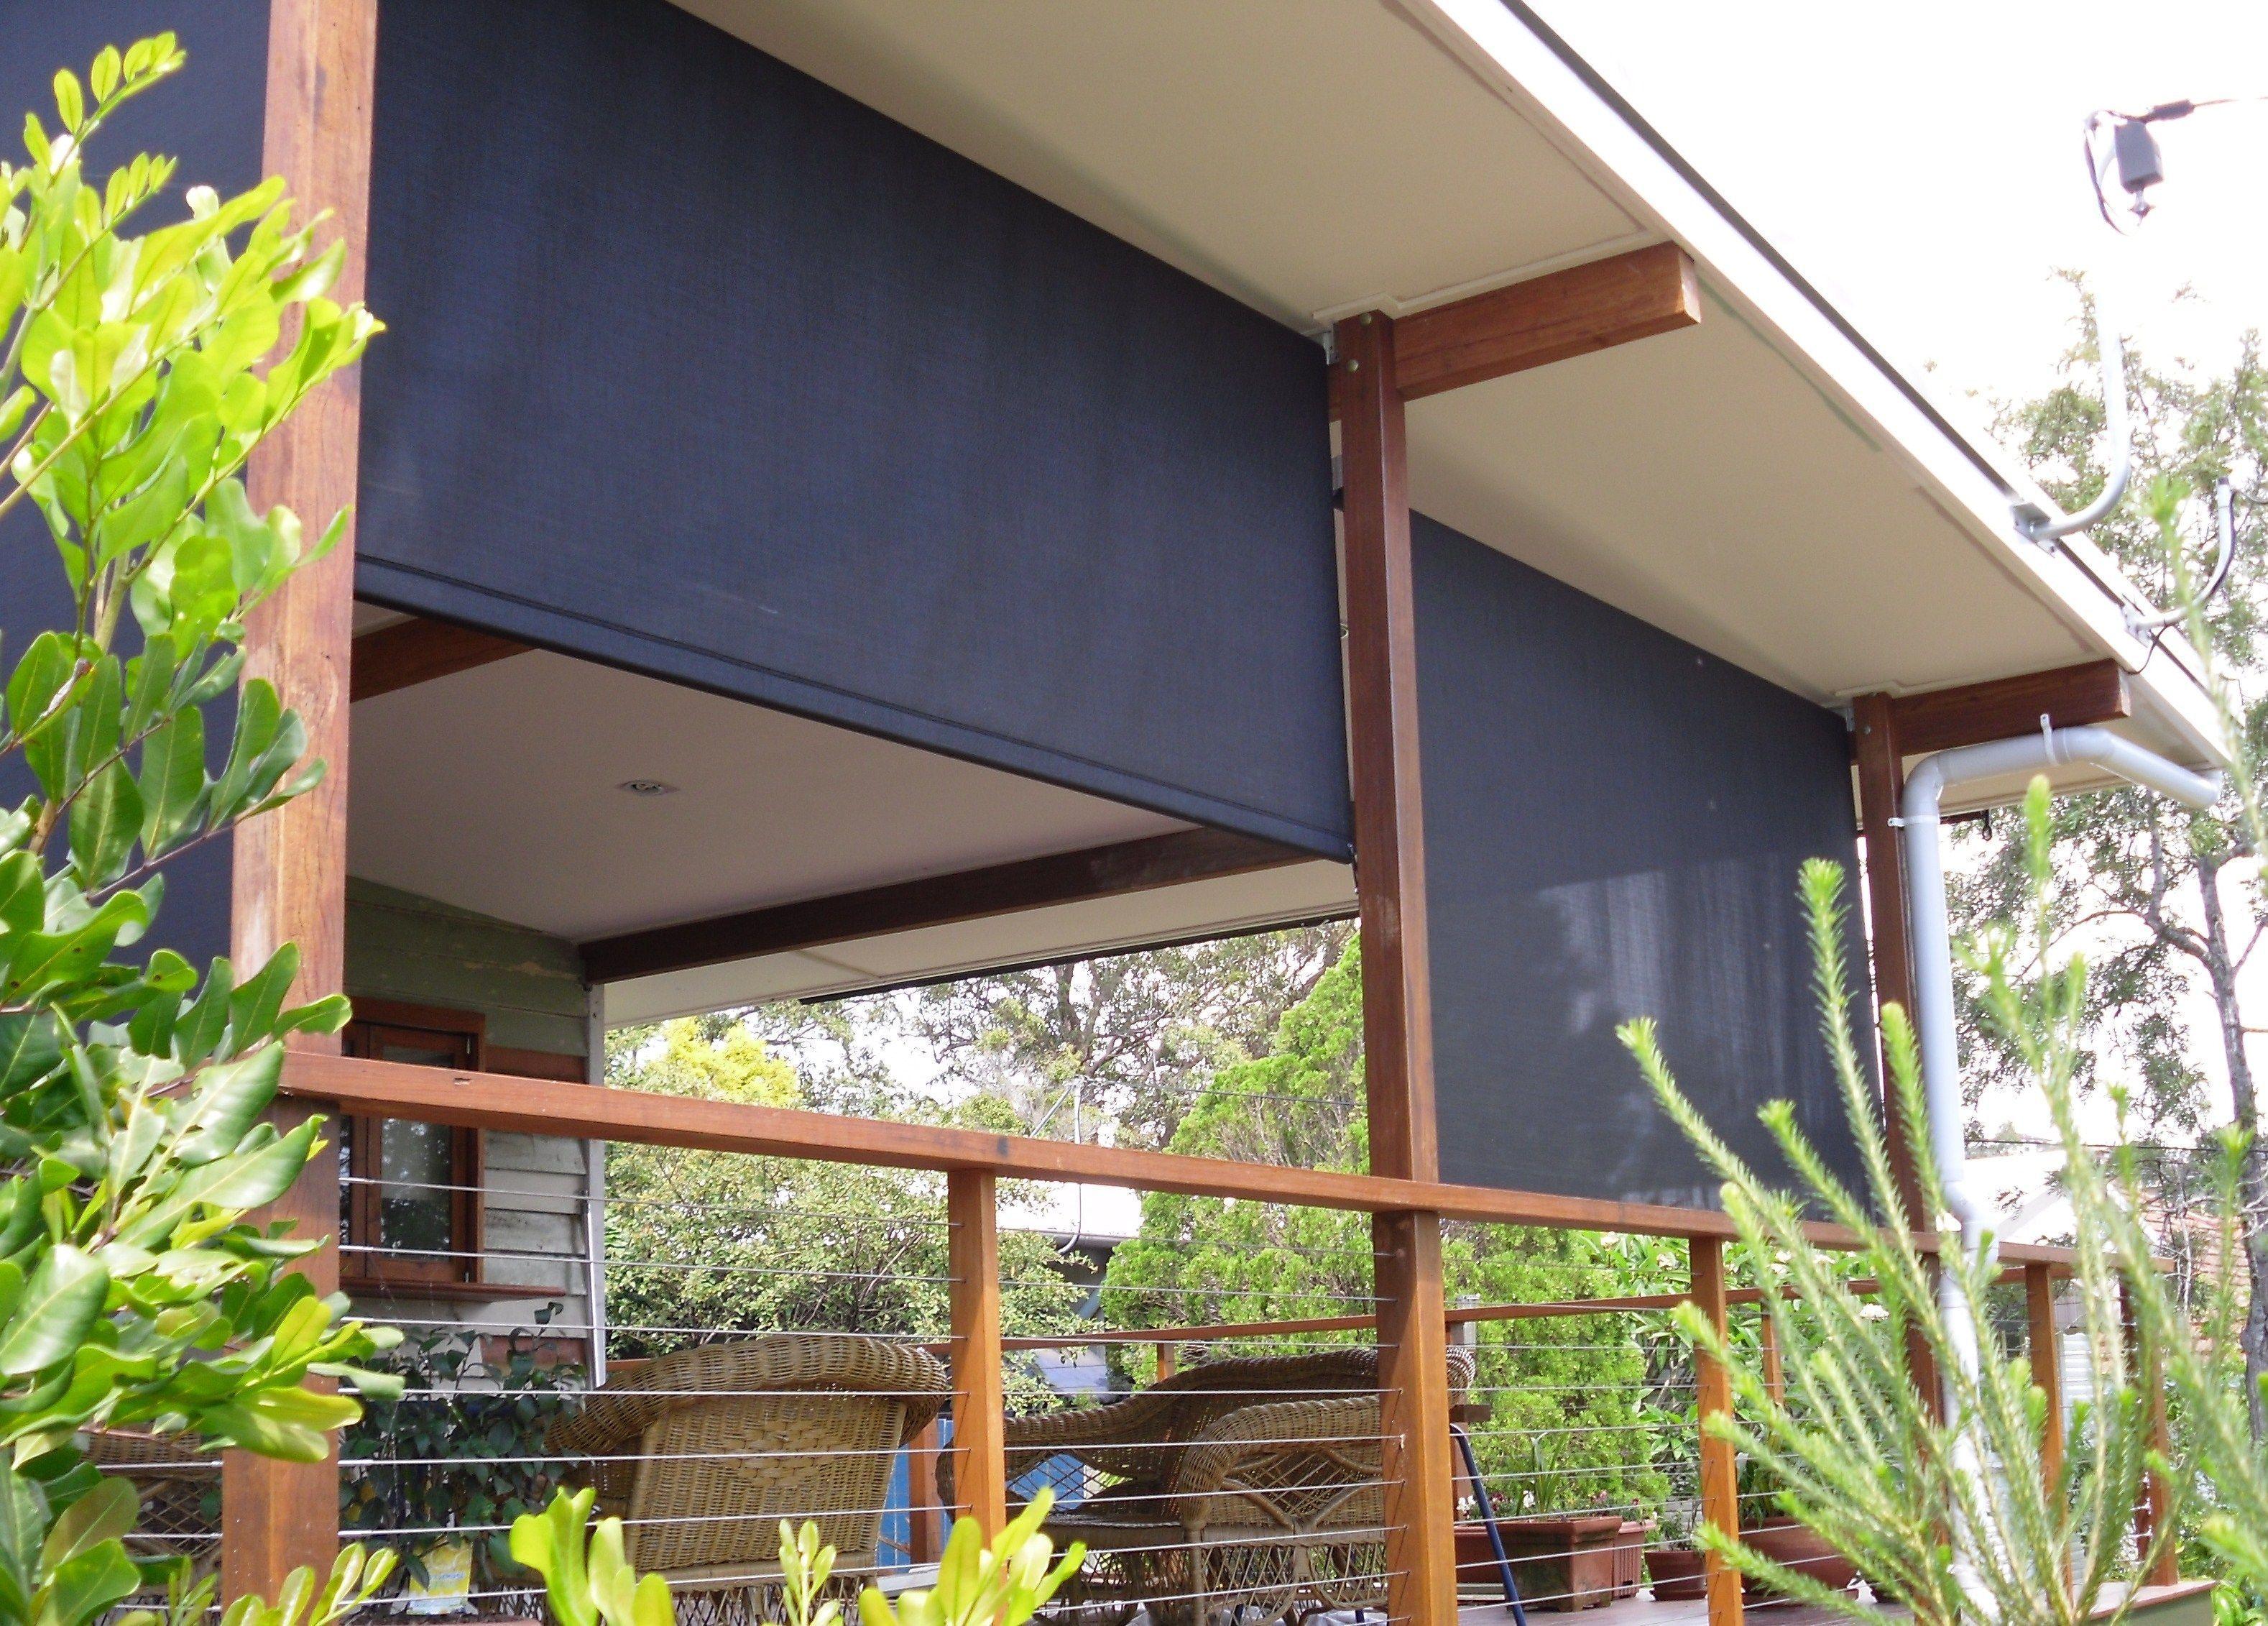 12 Wonderful Kitchen Blinds Diy Ideas Diy Blinds Outdoor